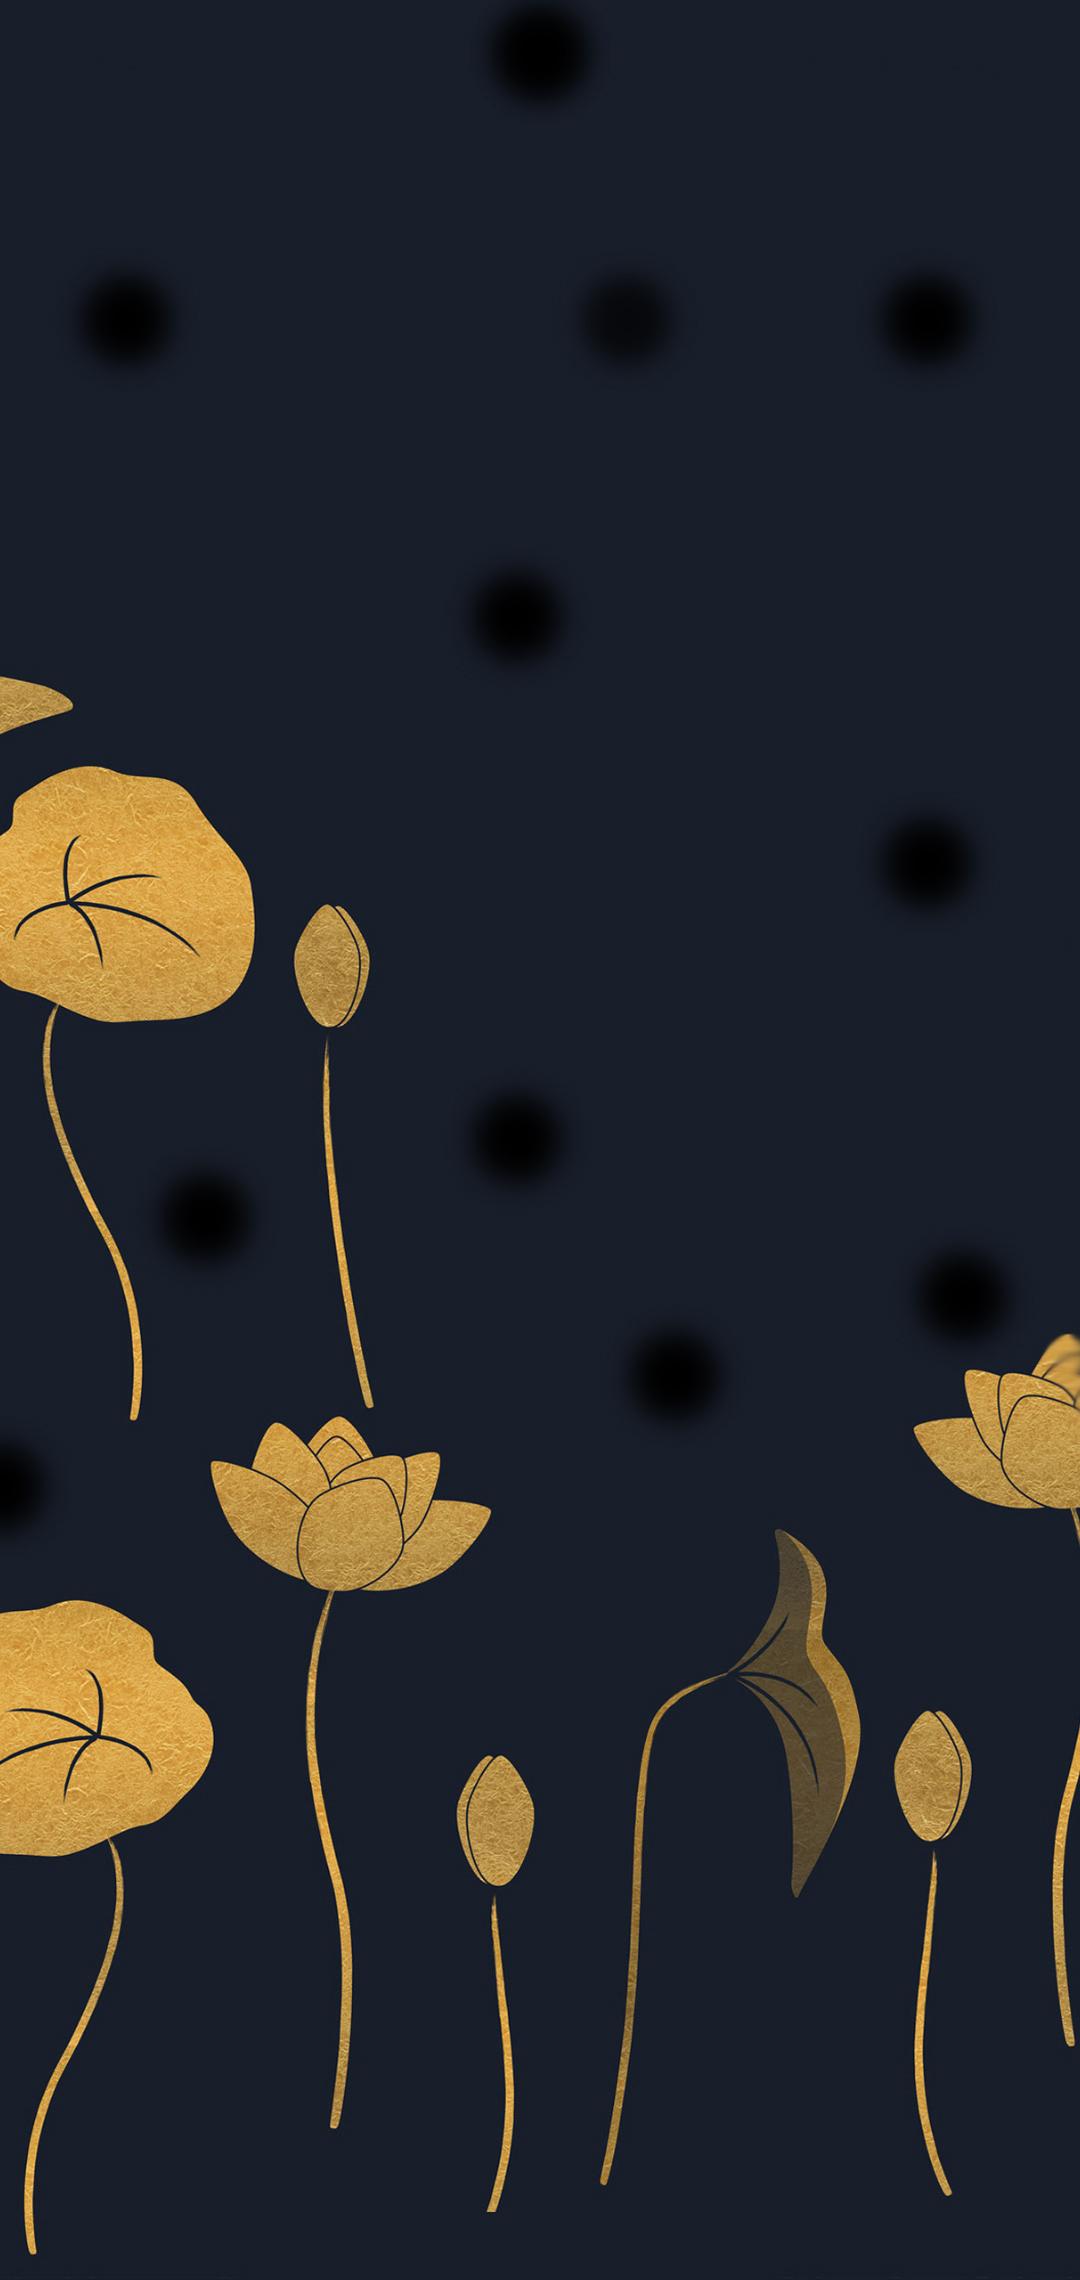 golden lotus art wallpaper